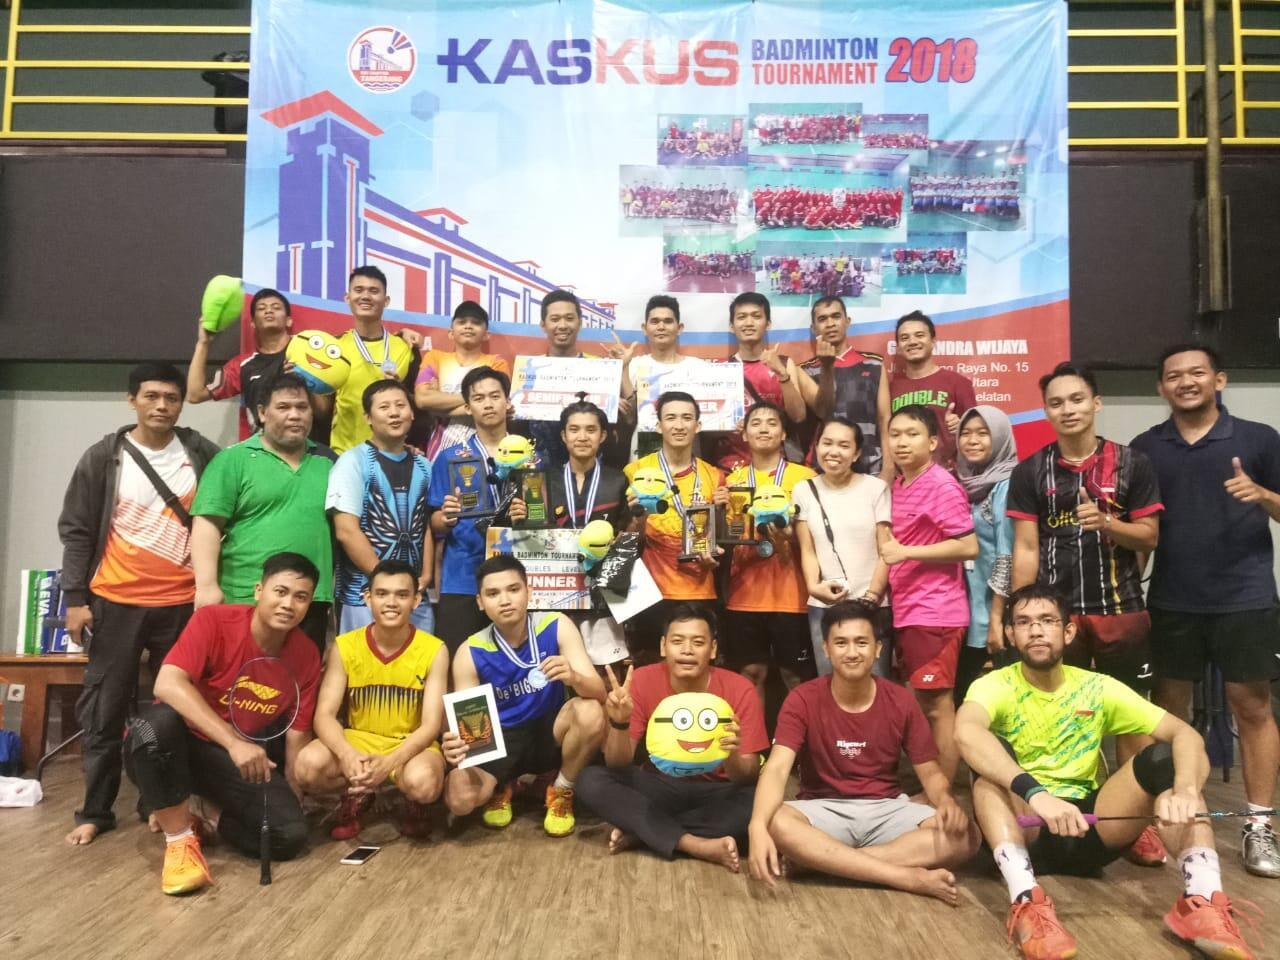 (FR) Field Report Kaskus Badminton Community TURNAMENT 2018 (Present KBC Tangerang)